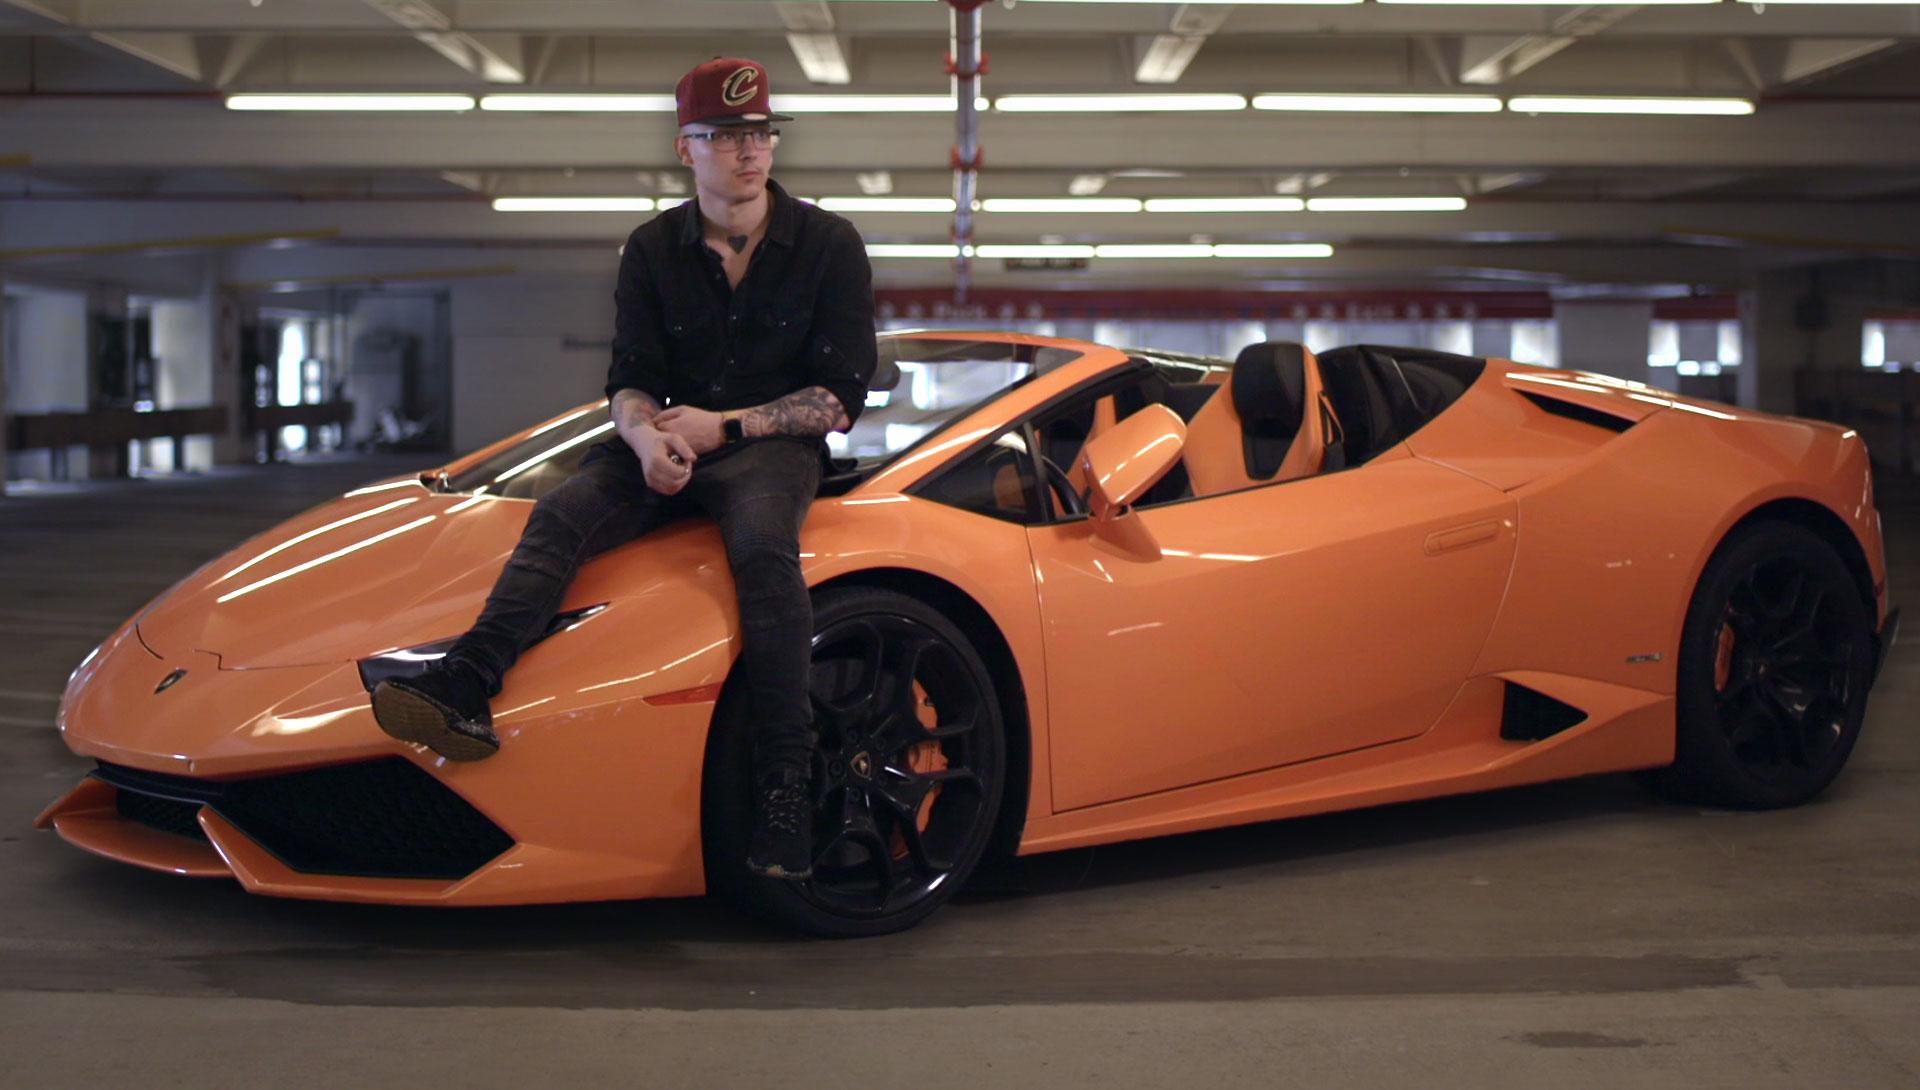 Inside Miami S Luxury Car Hustle Fake It Til You Make It Vice